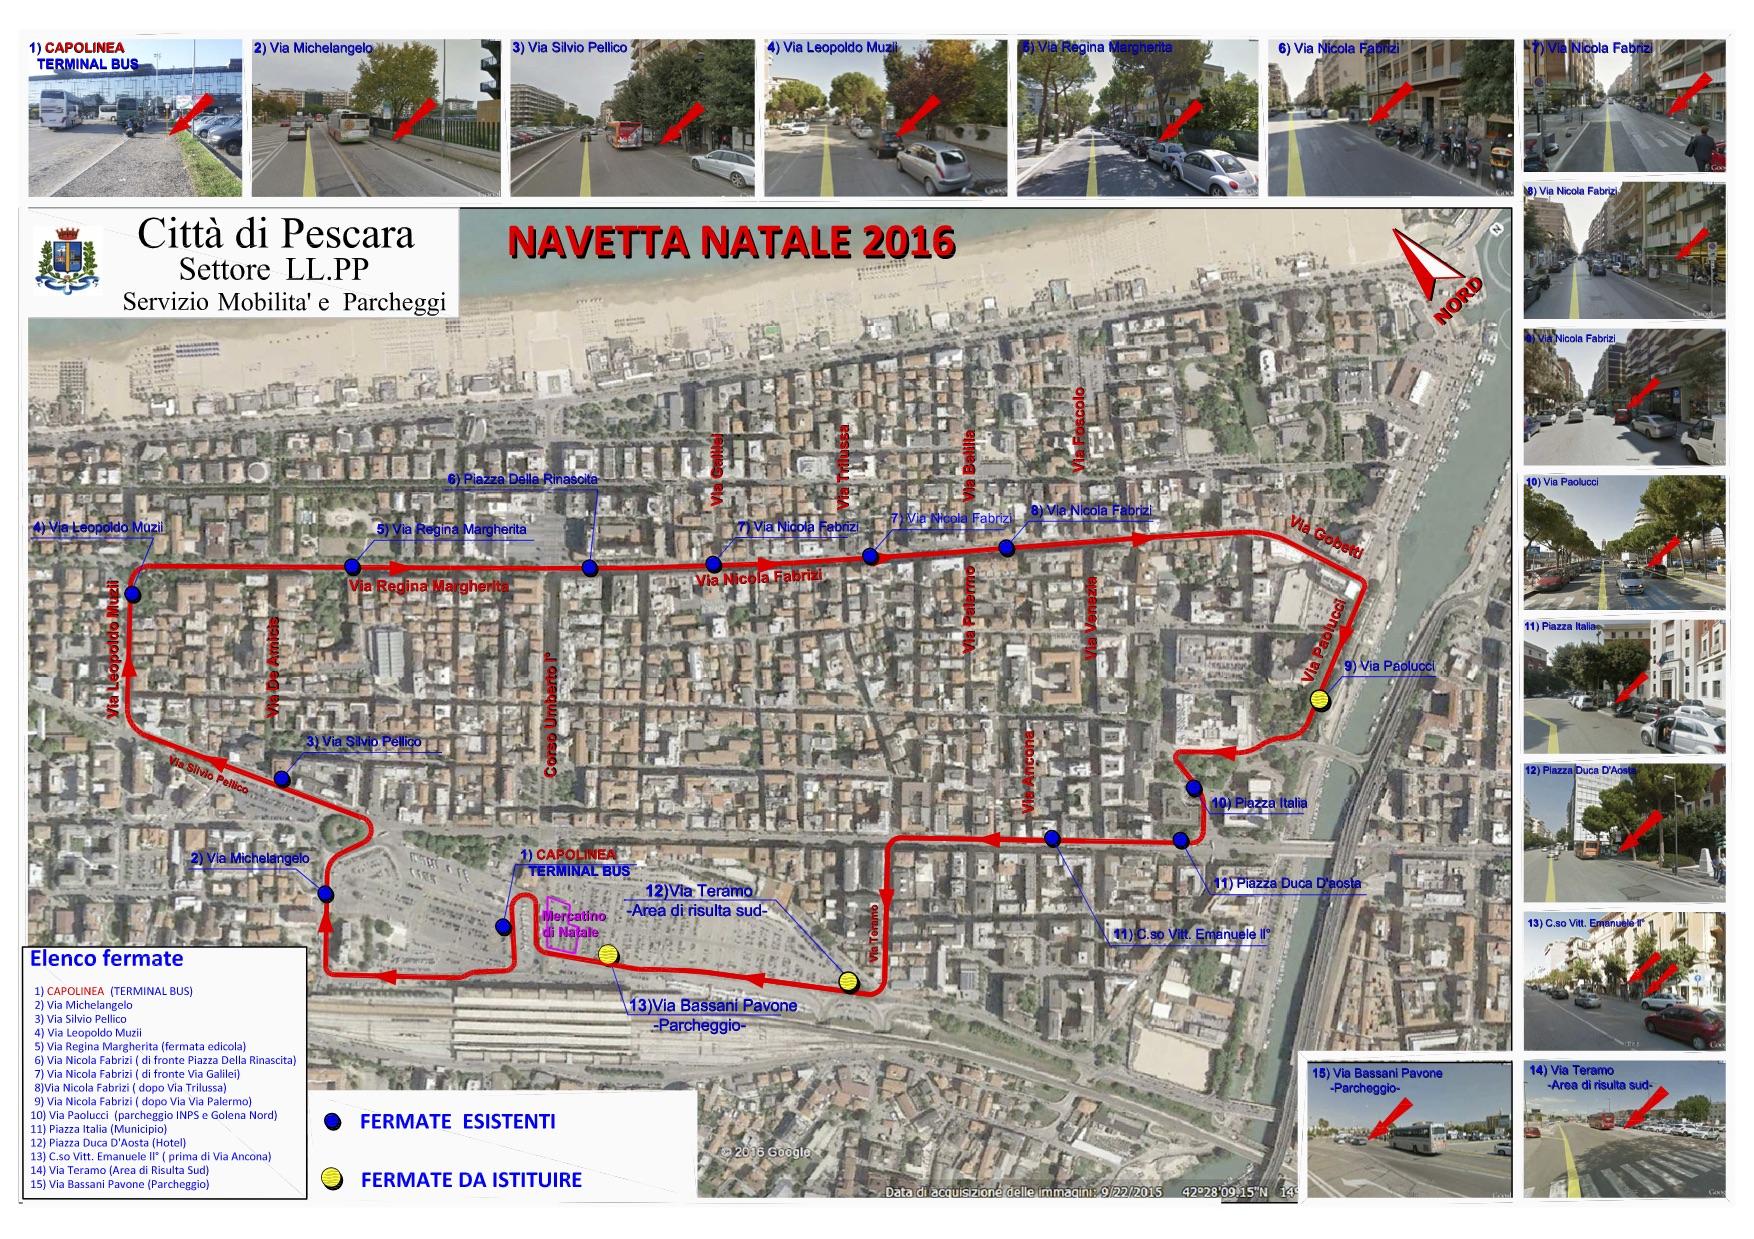 navetta-natale-2016-23-11-2016